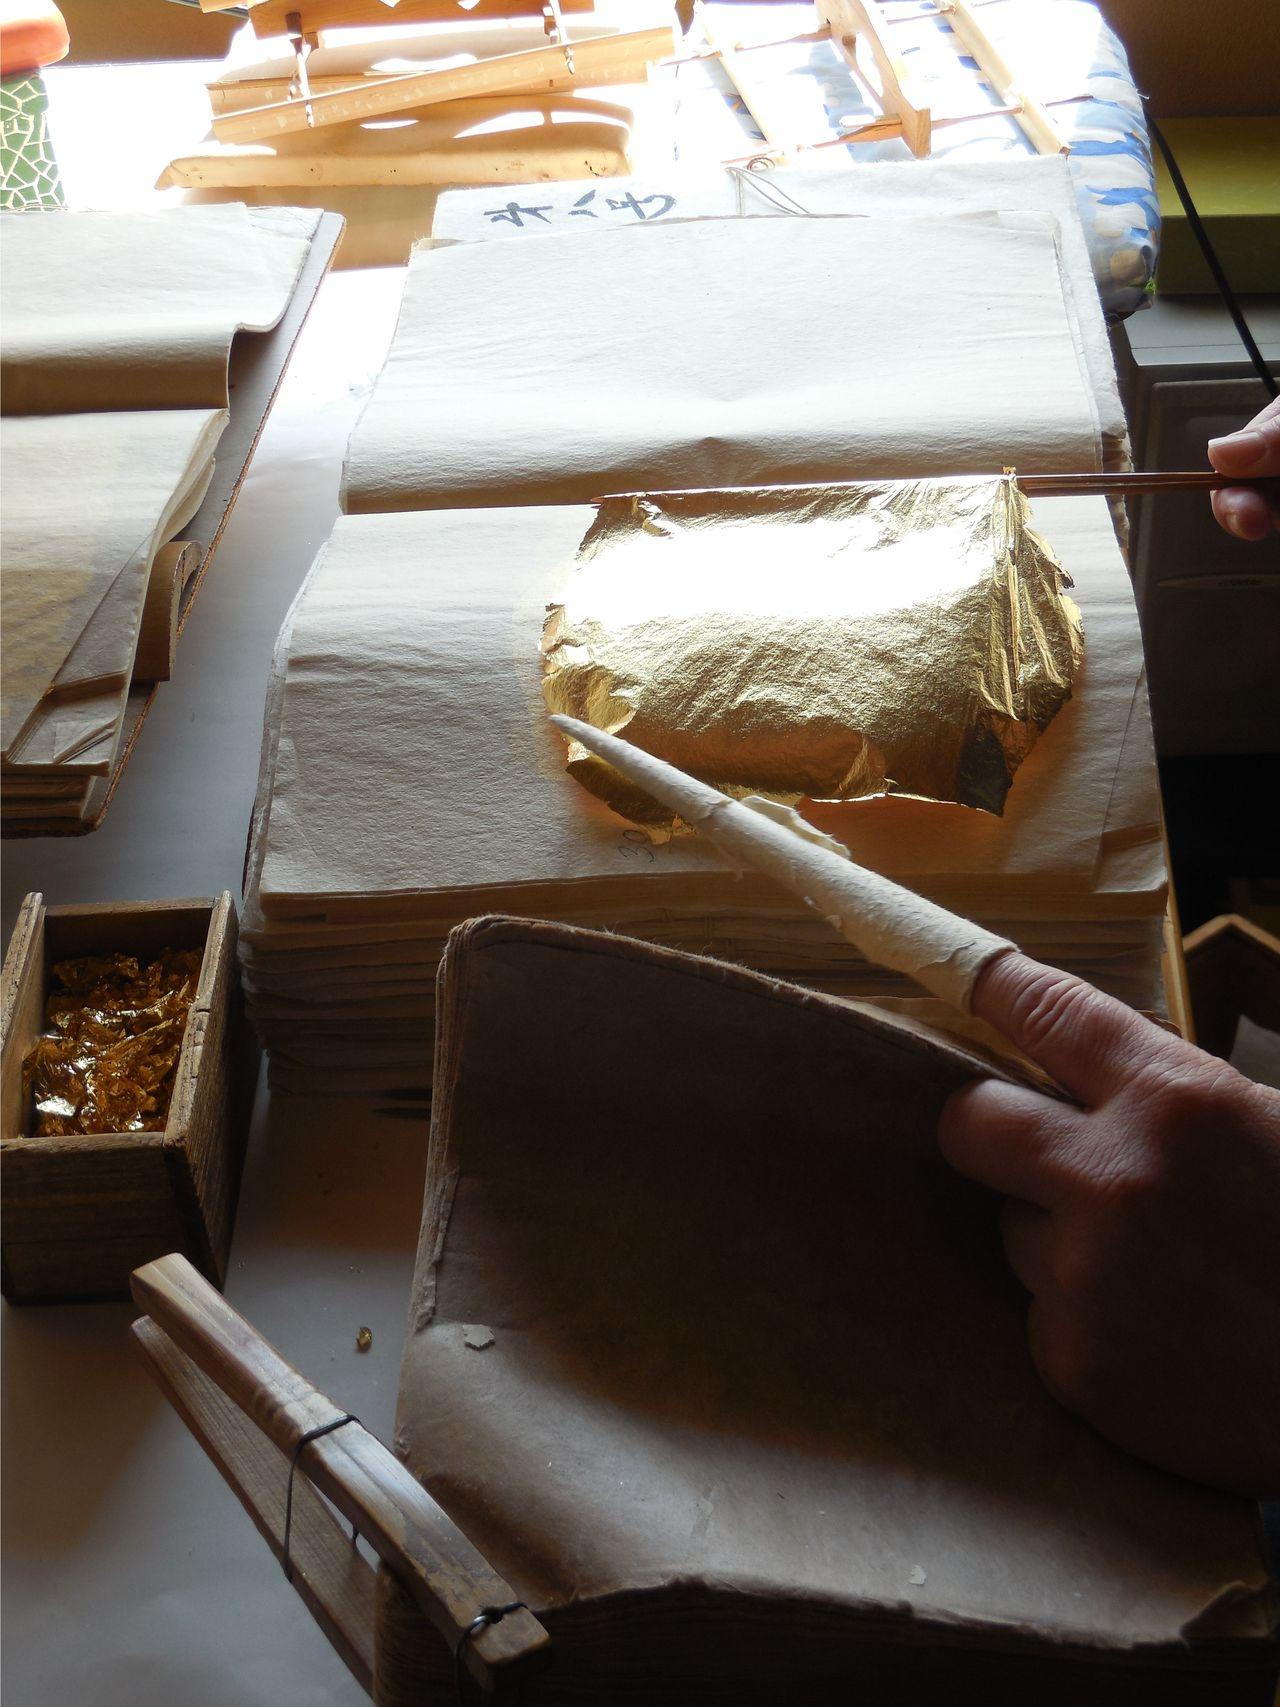 Produksi tradisional daun emas entsuke. (© Jiji; Masyarakat Pelestarian Teknik Tradisional Kanazawa Kinpaku)